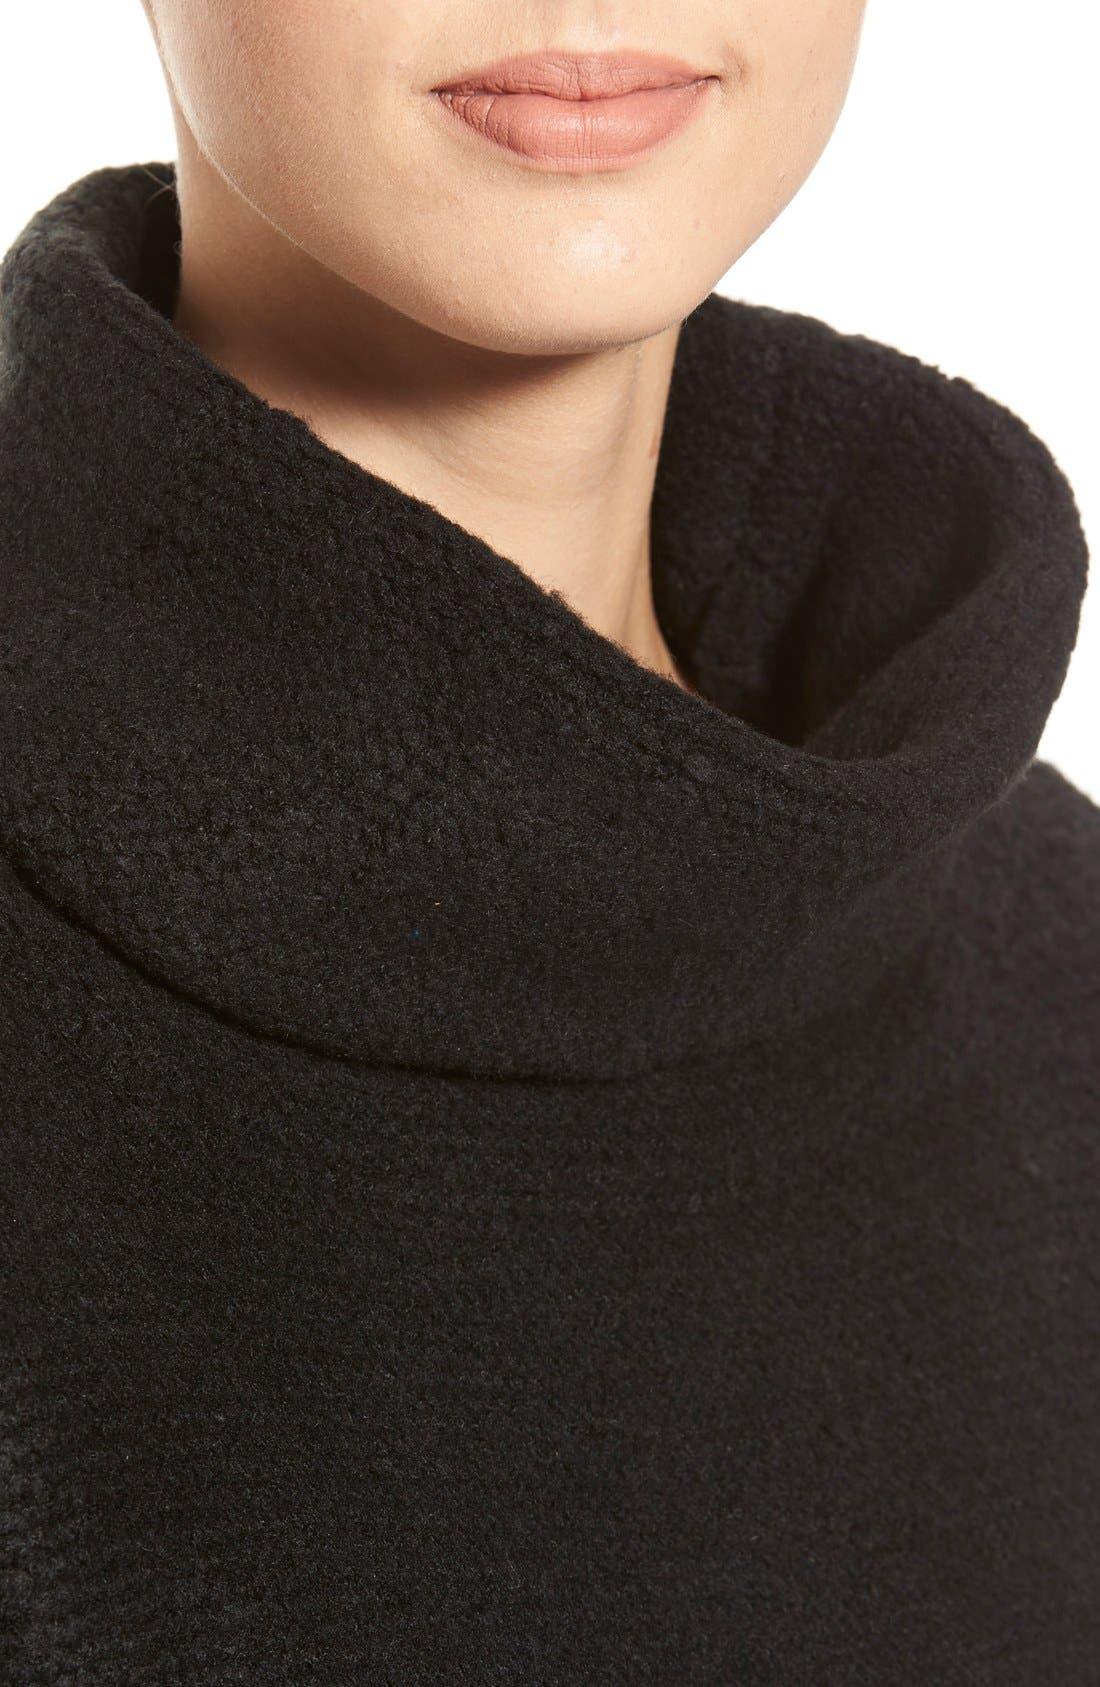 Boxy Turtleneck Sweater,                             Alternate thumbnail 3, color,                             001